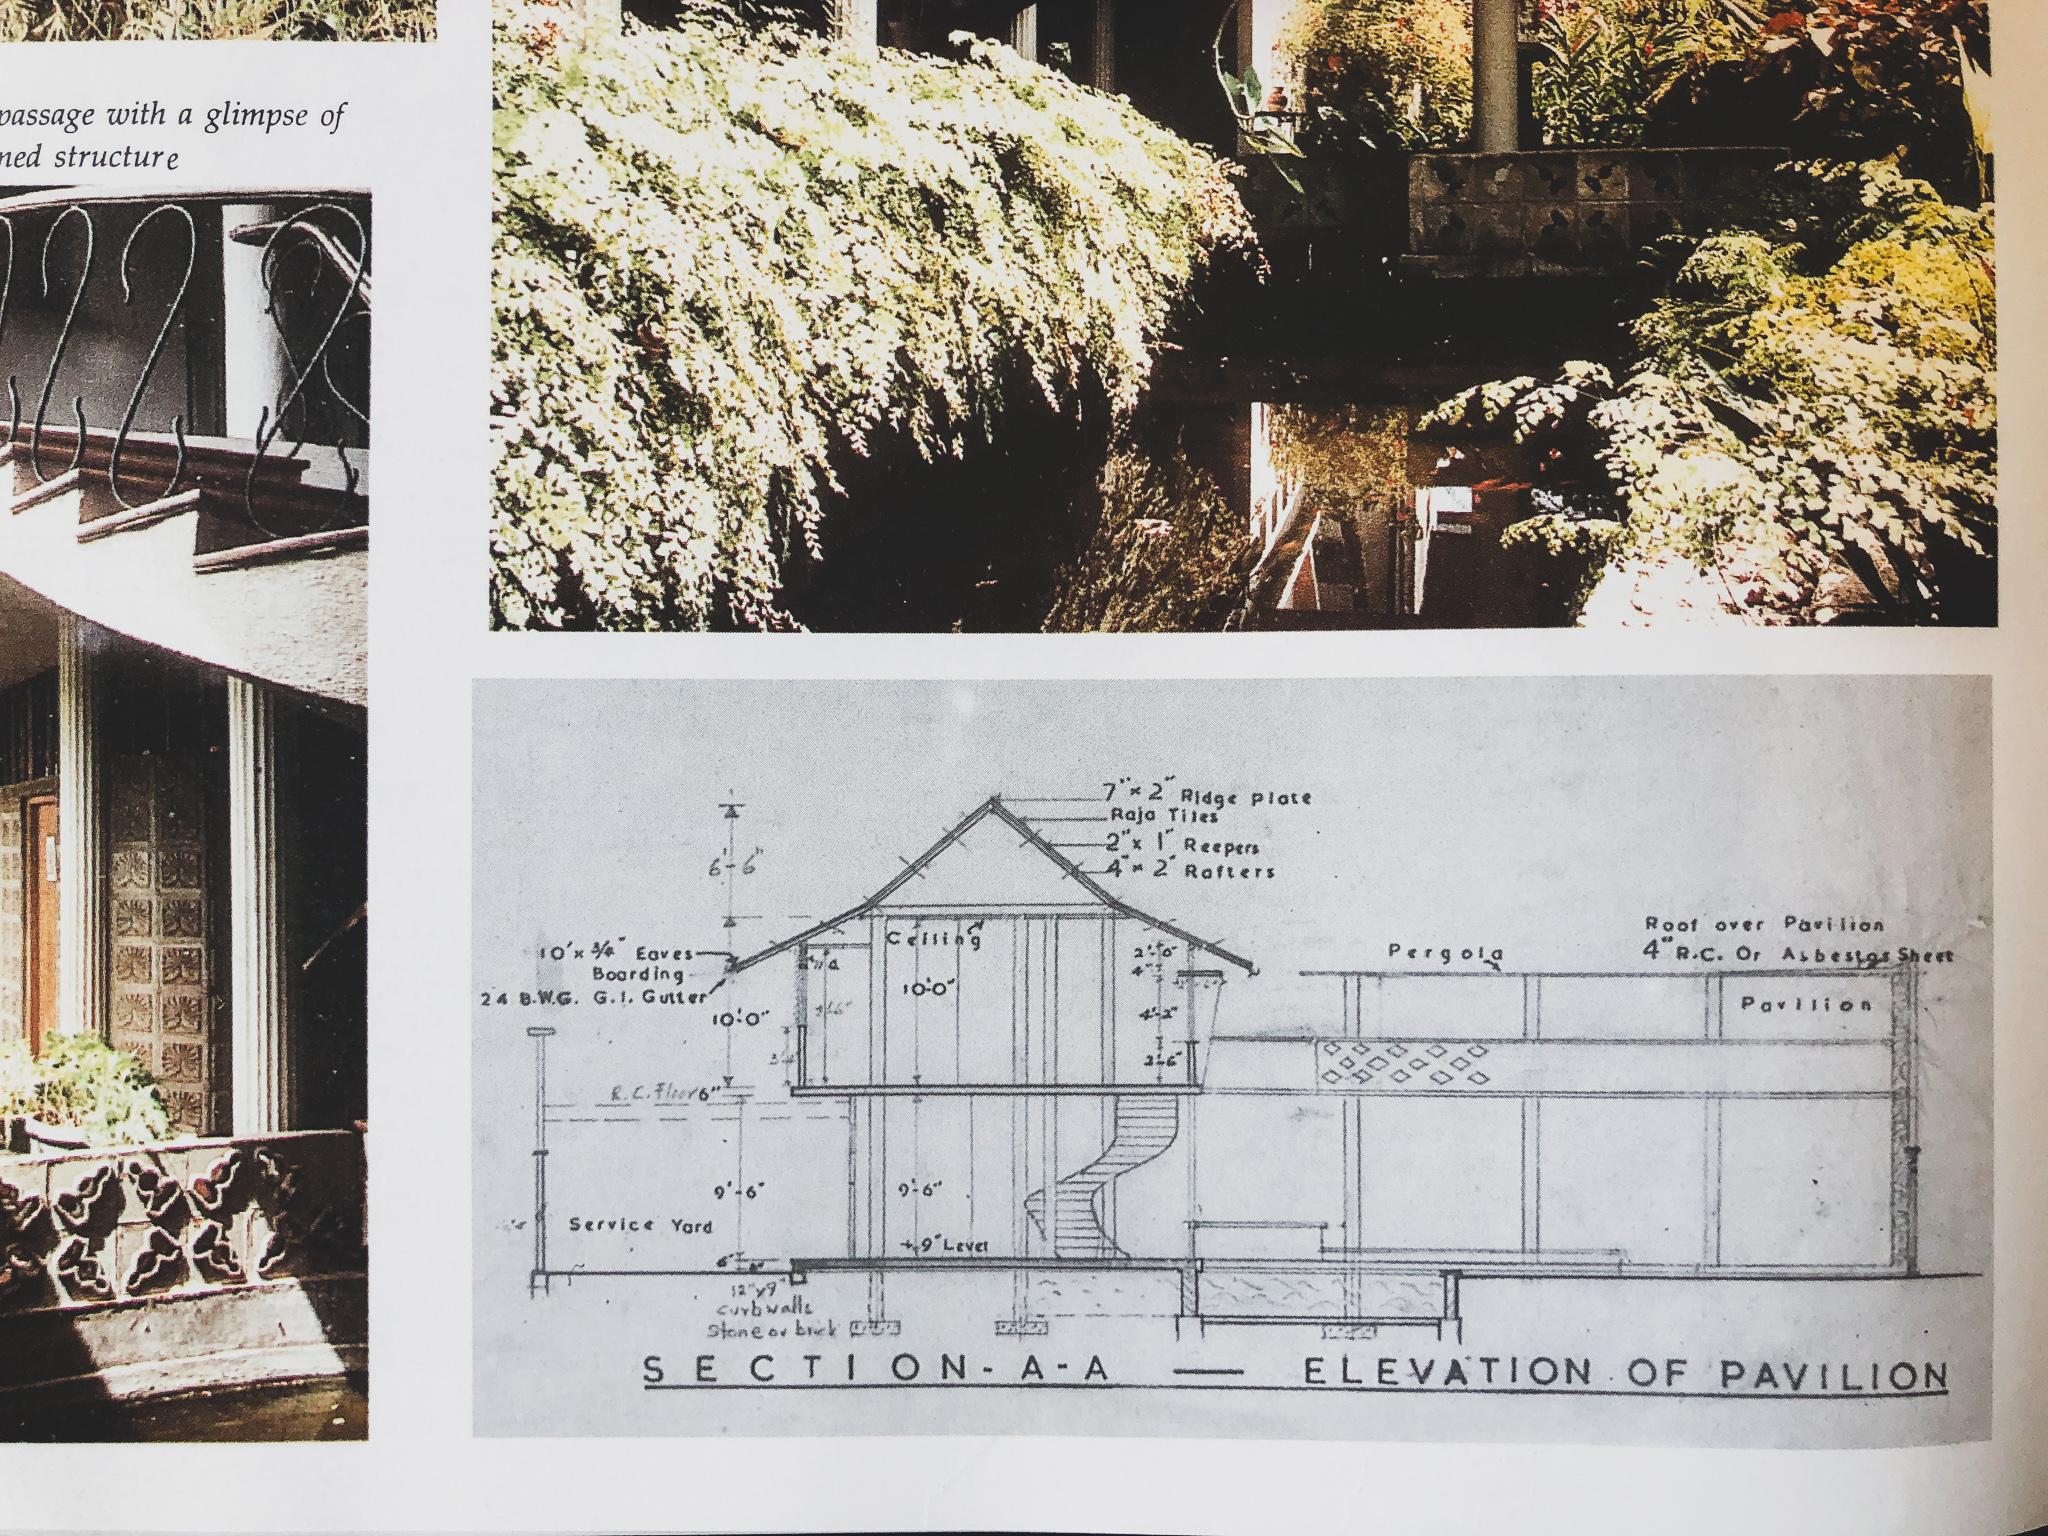 After Minnette Stories Of Female Sri Lankan Architects Sri Lanka By Ish